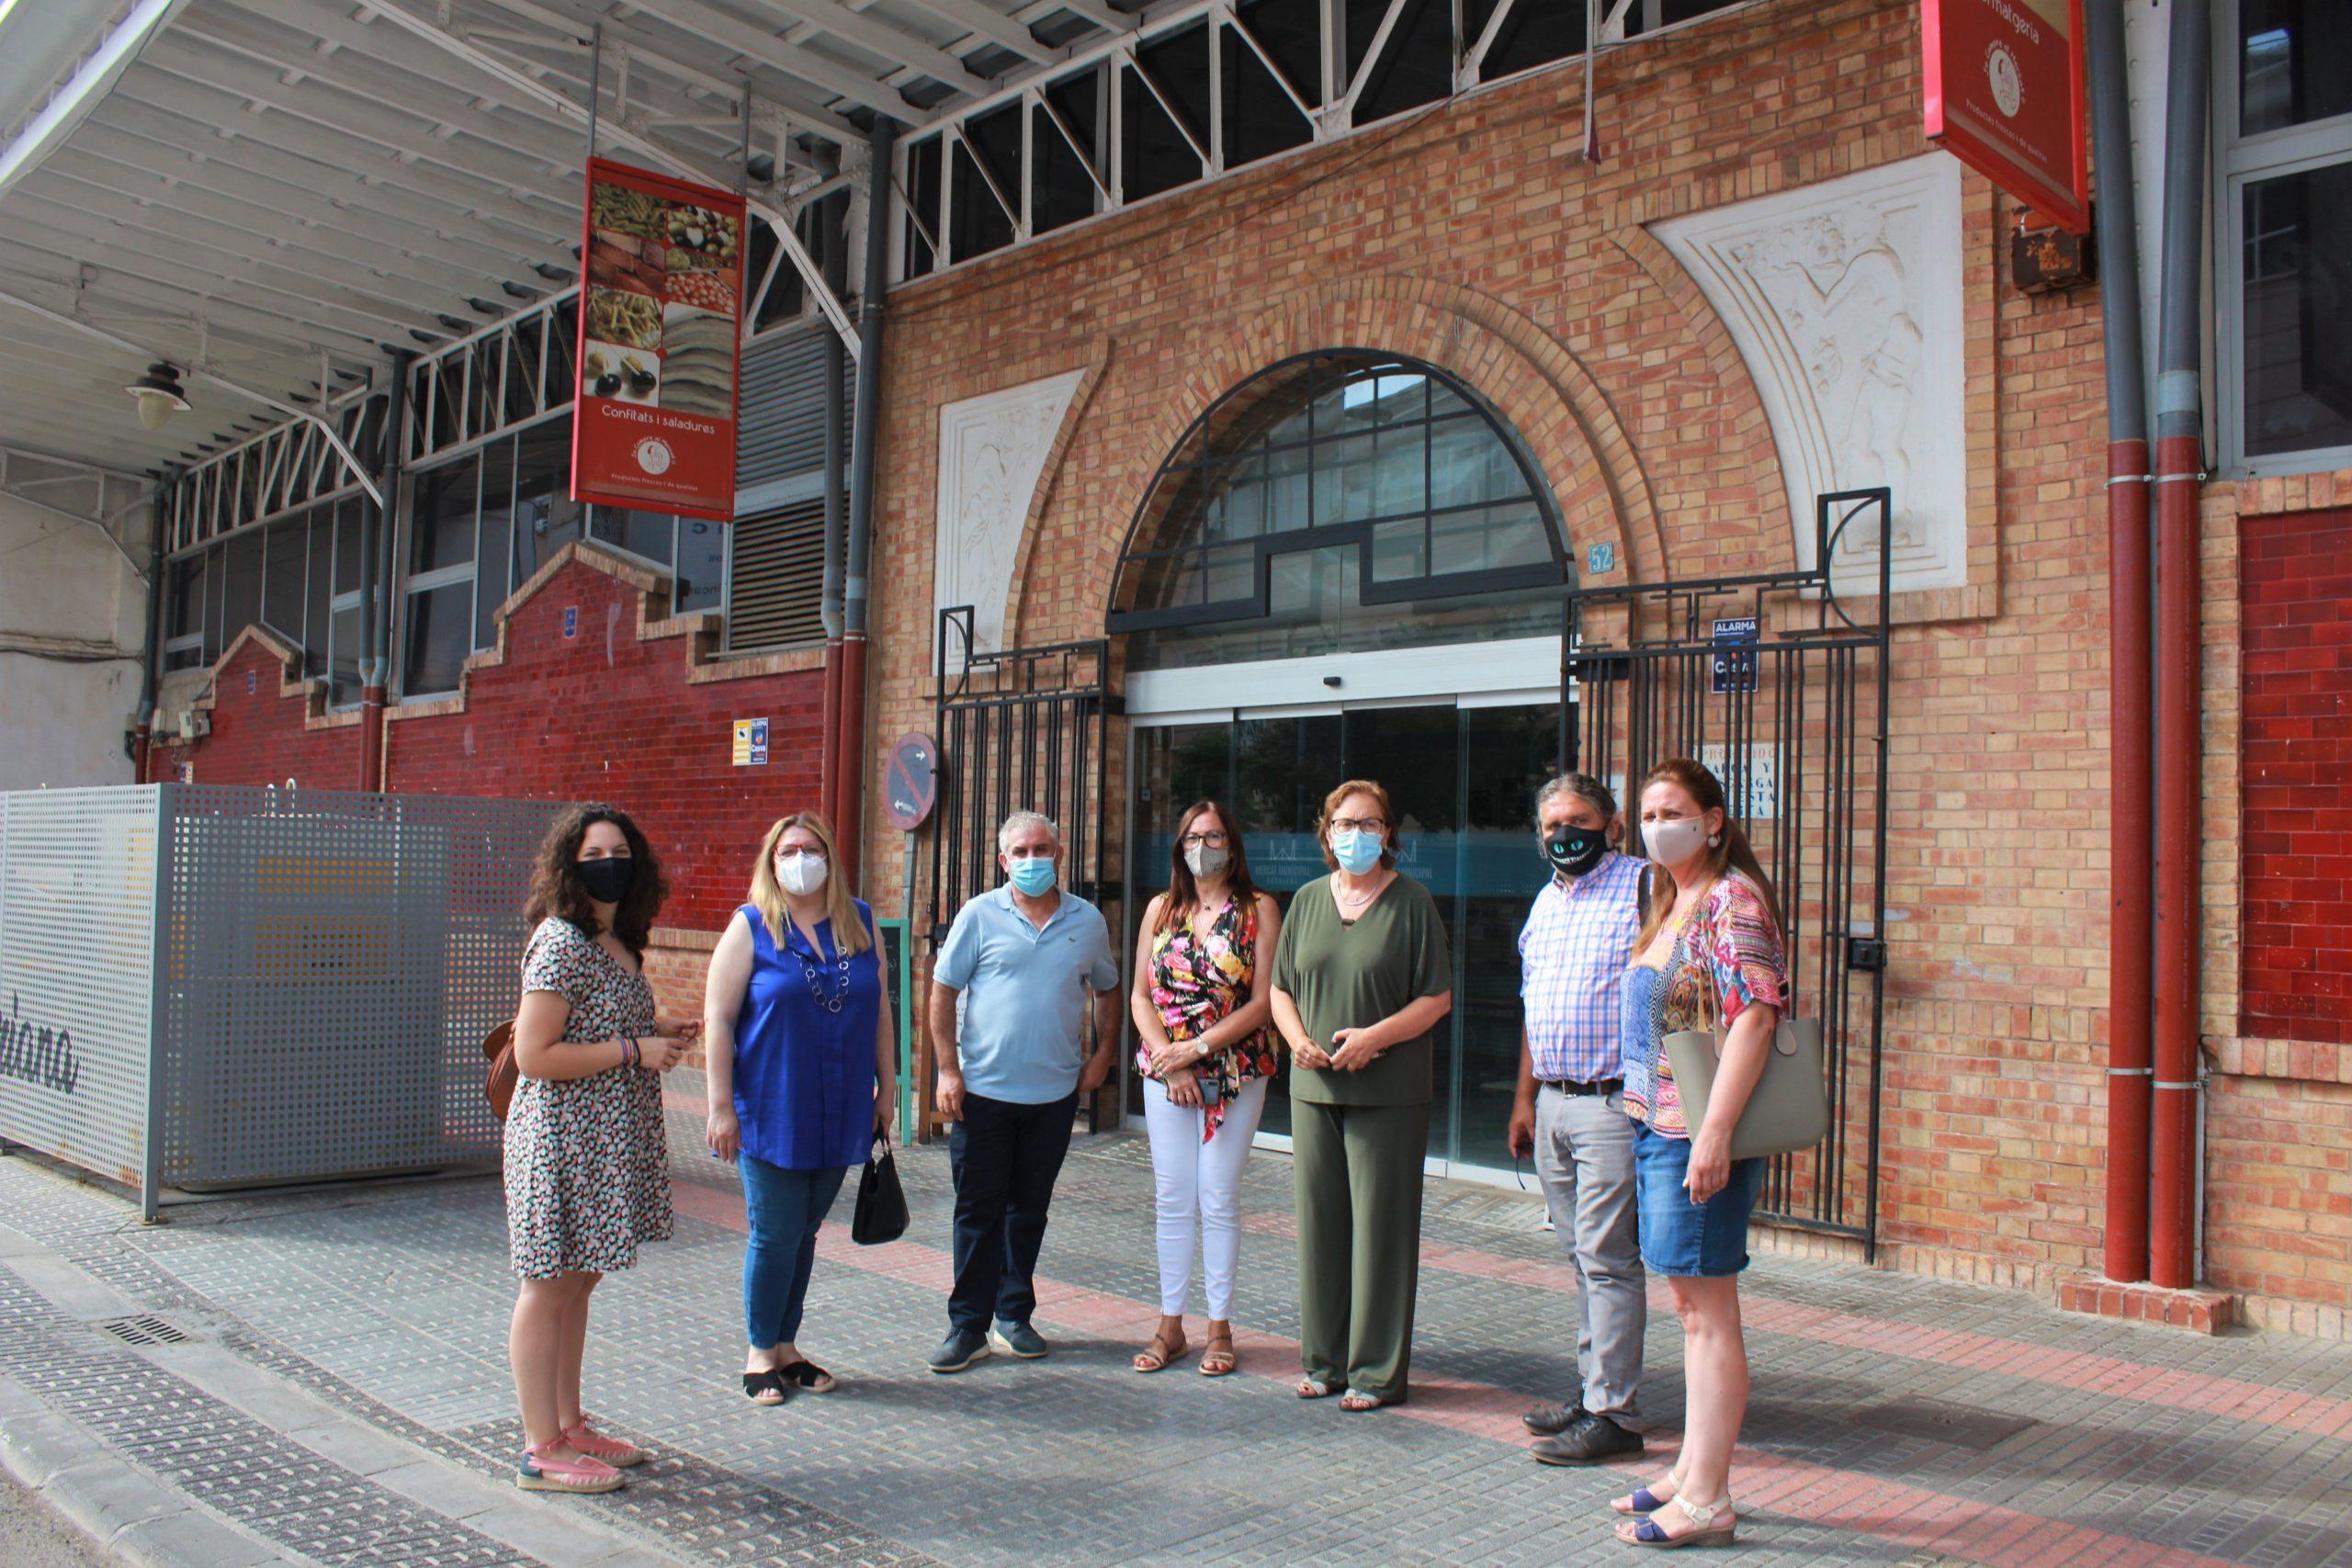 Burriana condena un acto de vandalismo contra la bandera LGTBI del Mercado Municipal